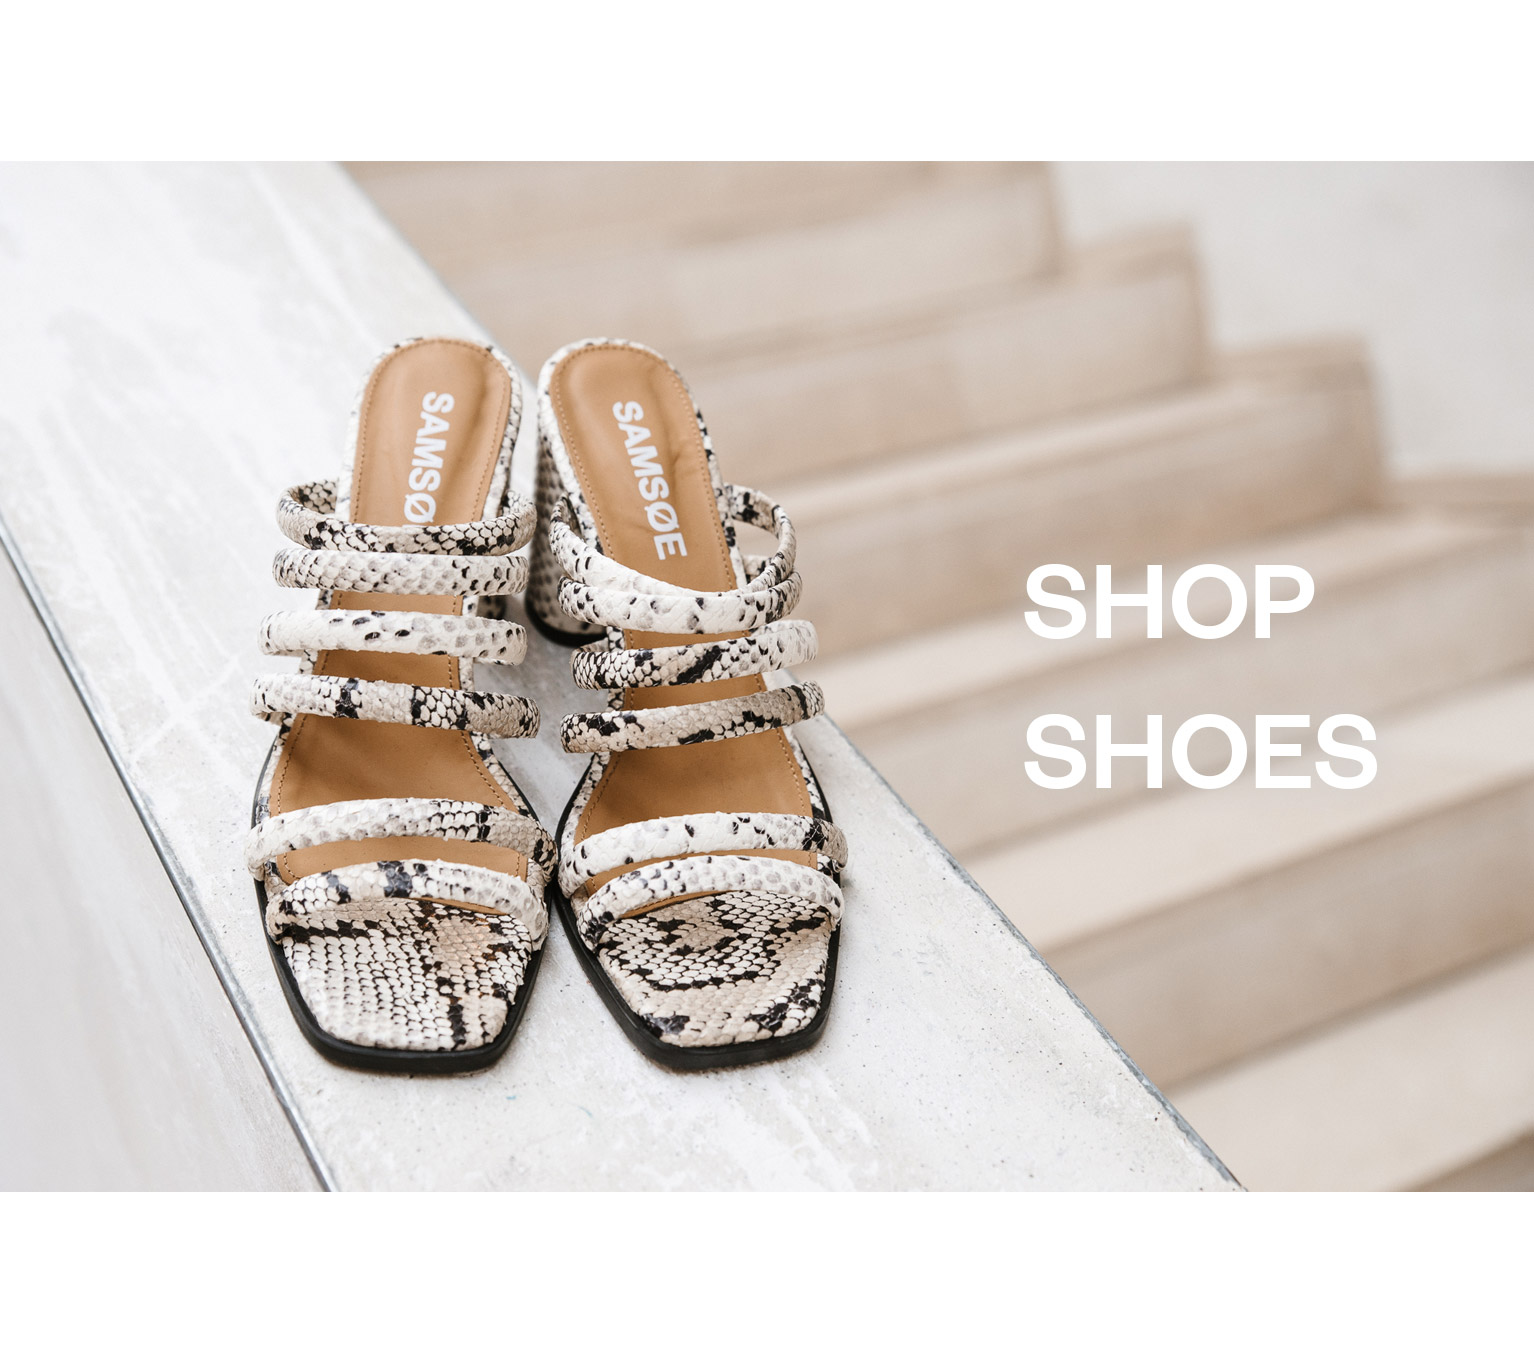 Shop Shoes Women's fashion M